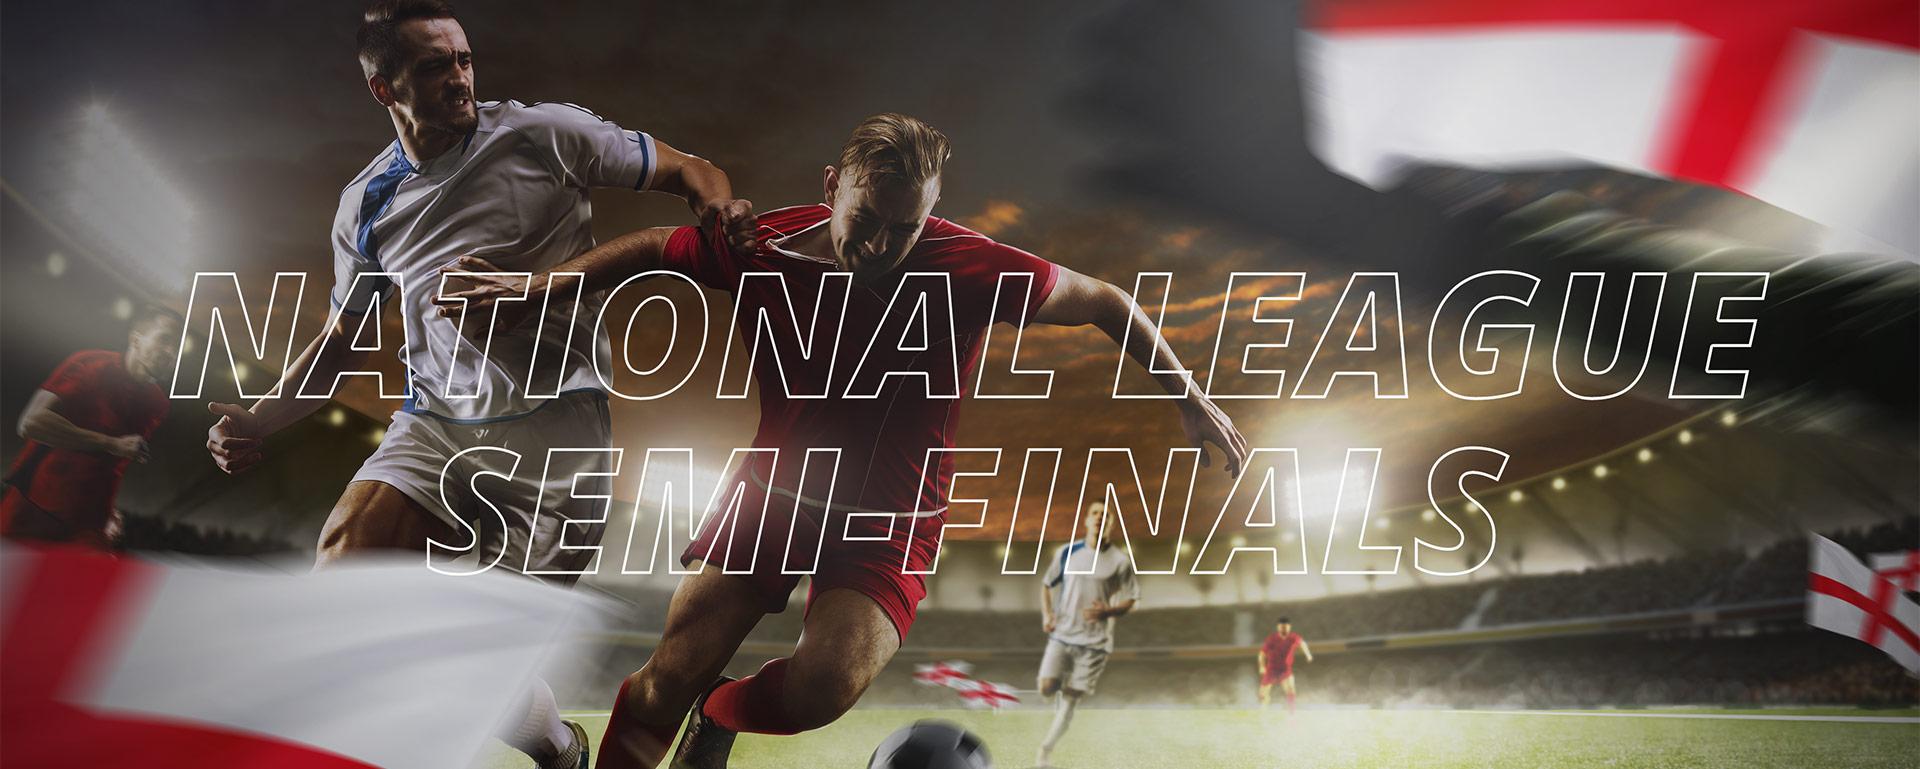 NATIONAL LEAGUE SEMI-FINAL PREVIEWS